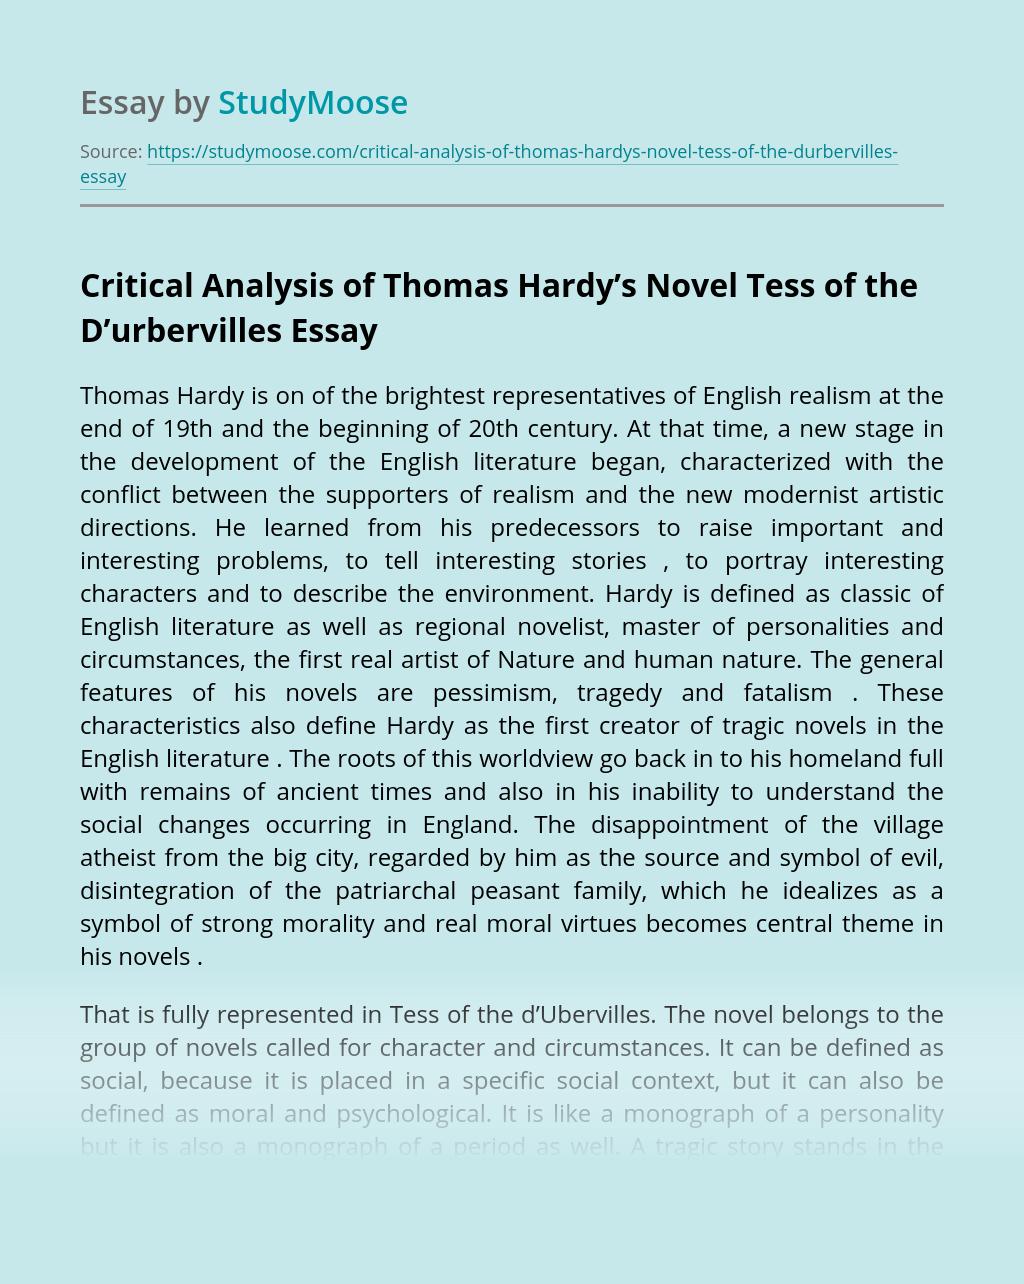 Critical Analysis of Thomas Hardy's Novel Tess of the D'urbervilles